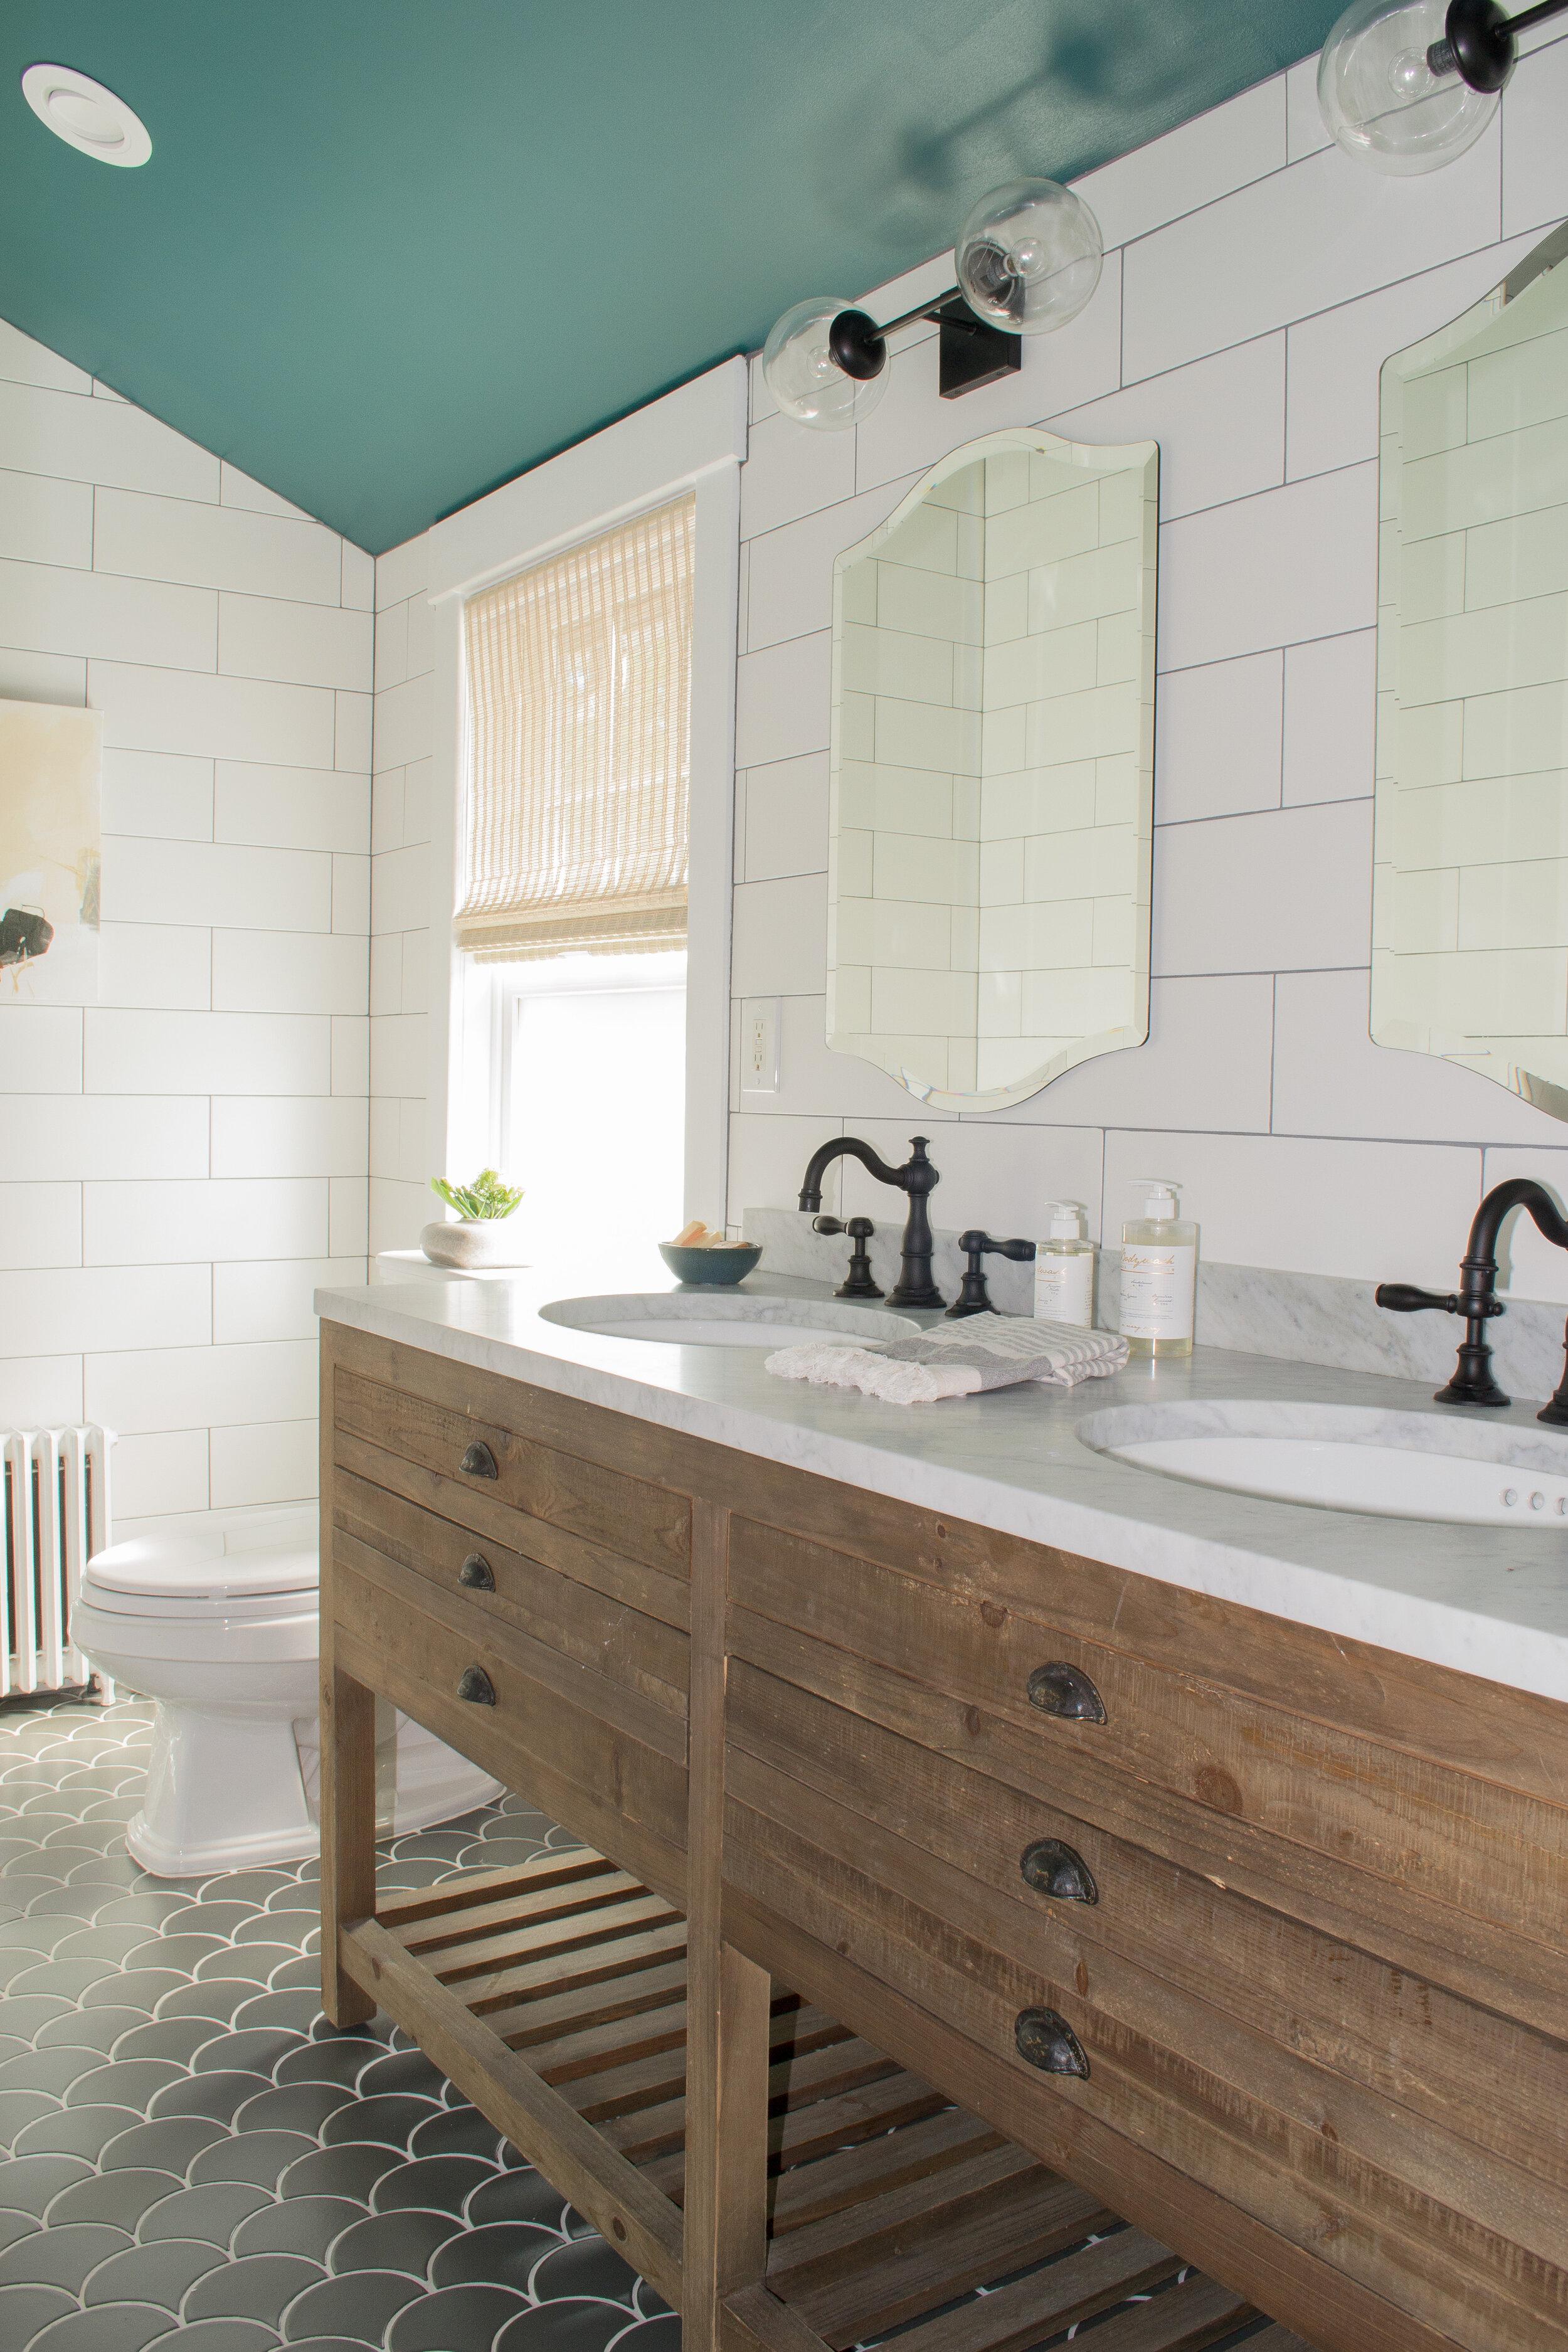 bathroom-green-modern-farmhouse-tc-interiors-2.jpg